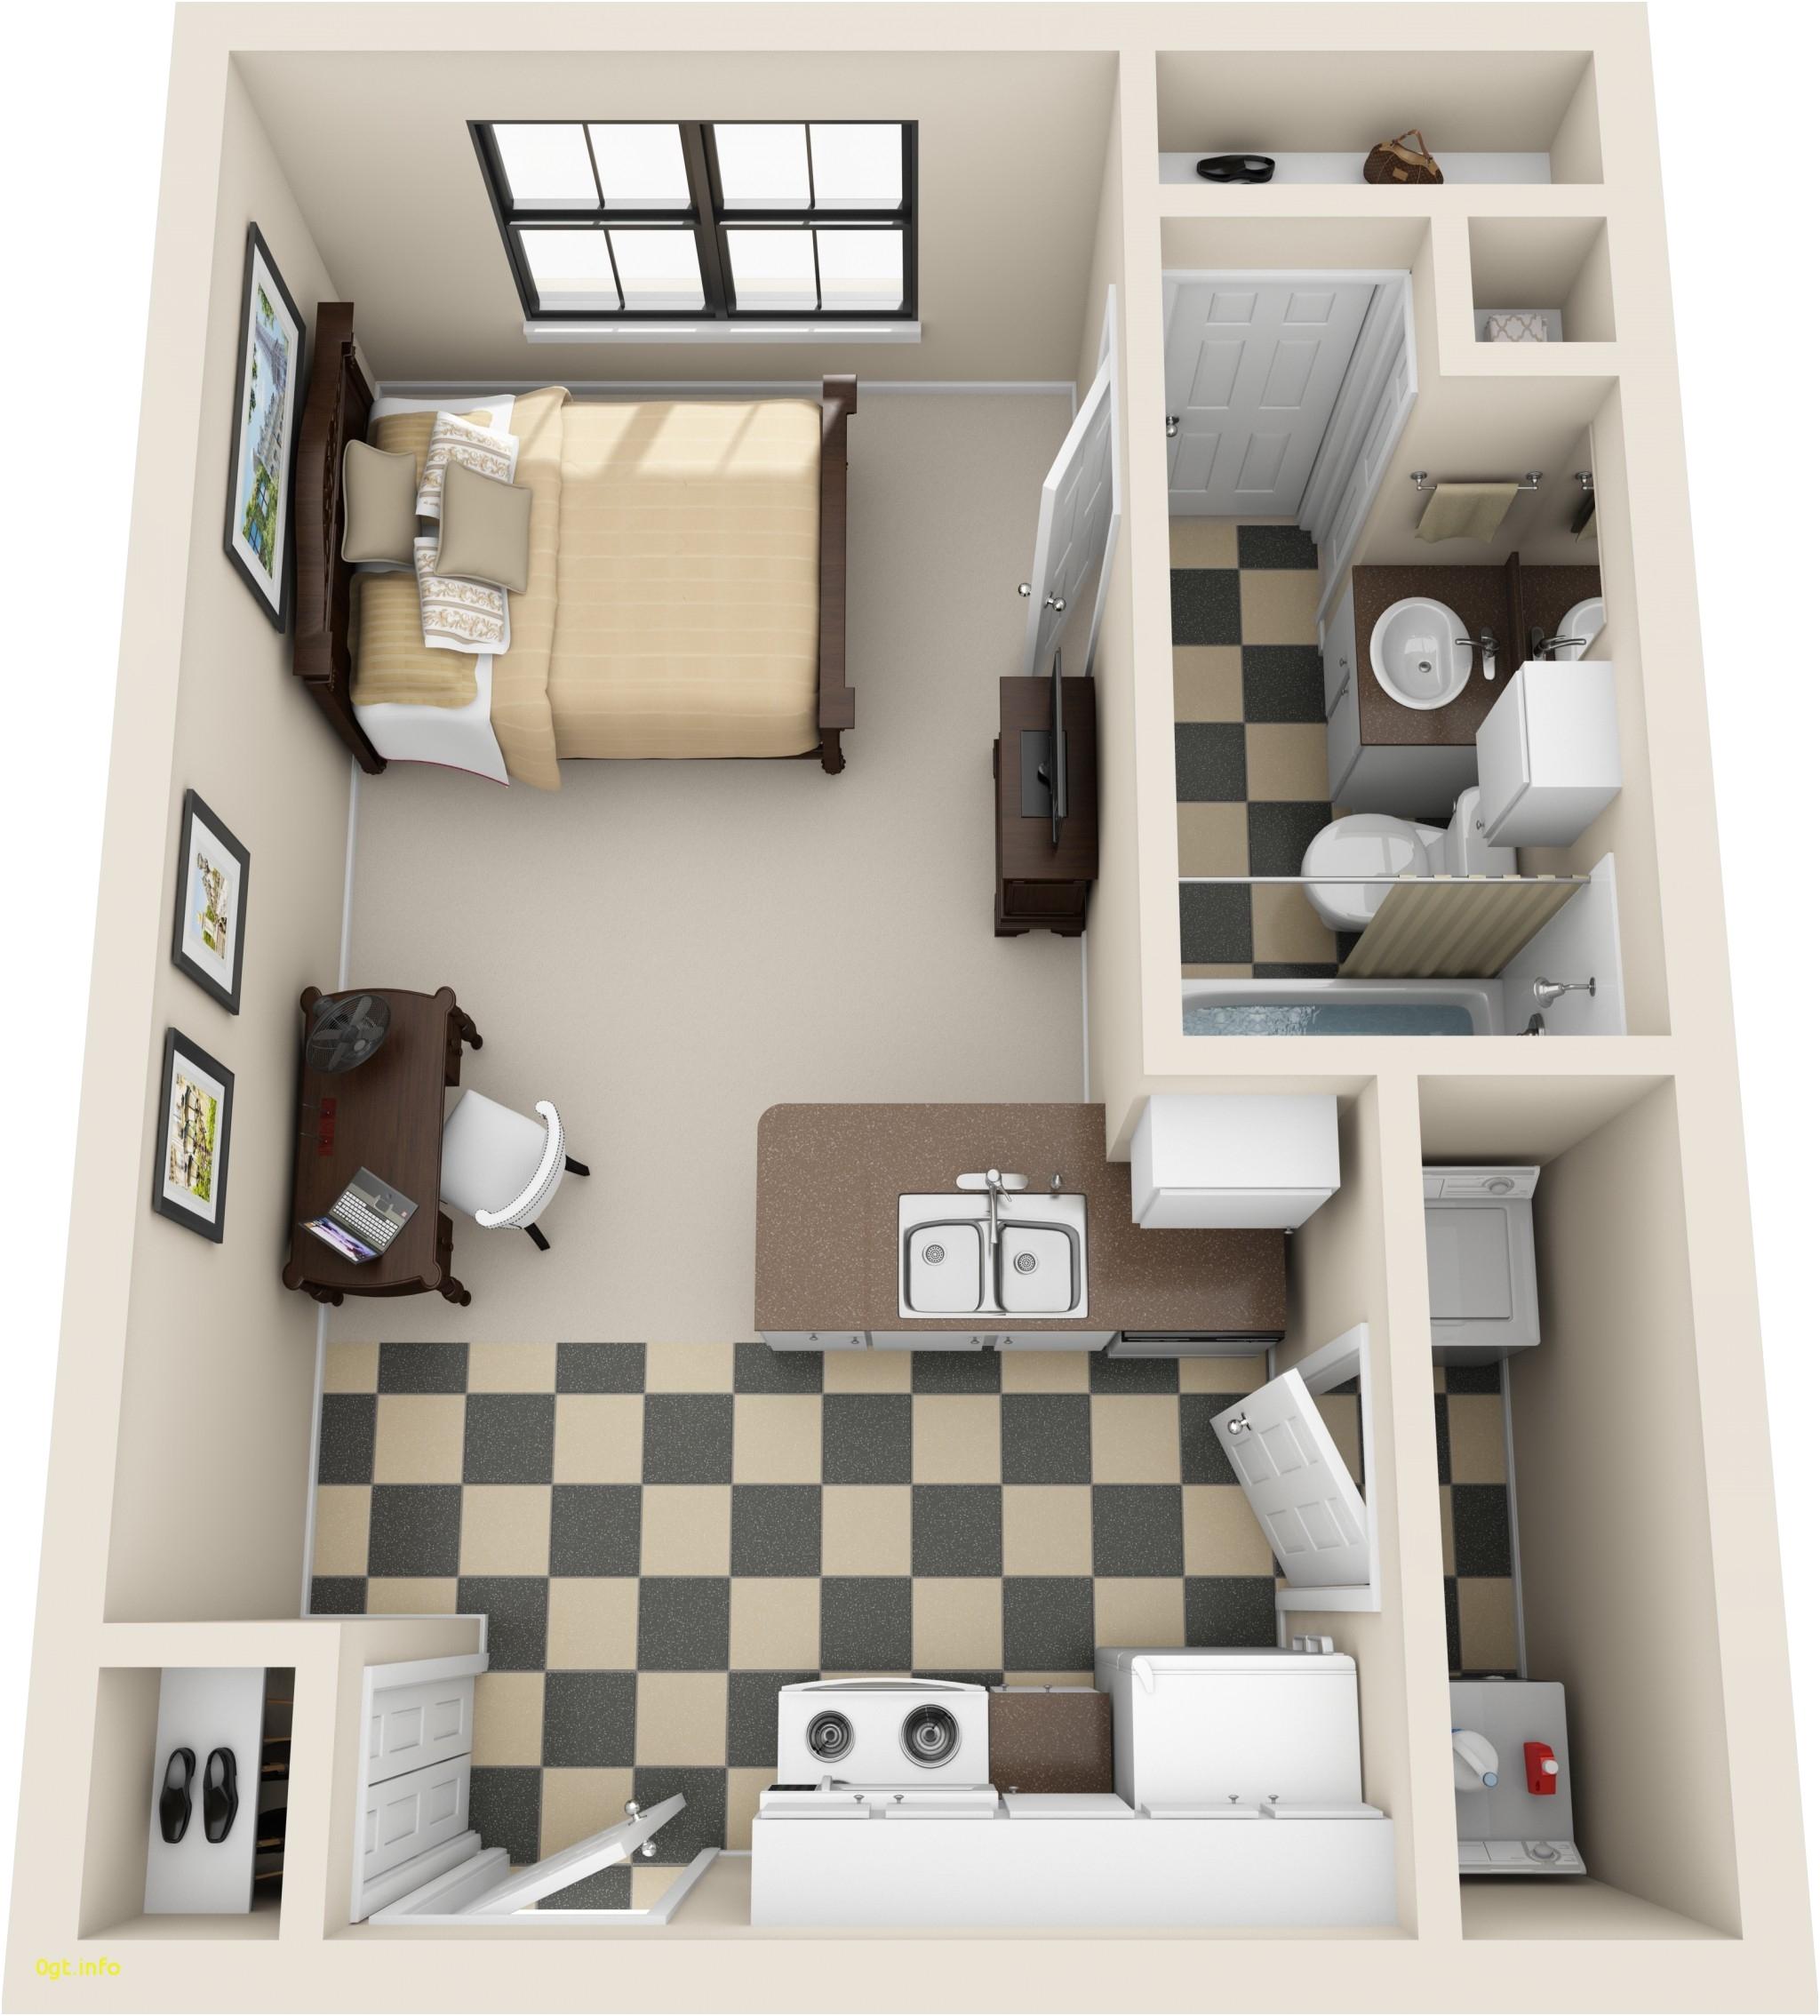 1 bedroom apartments madison wi luxury madison al apartments downtown rent to own madison wi condos